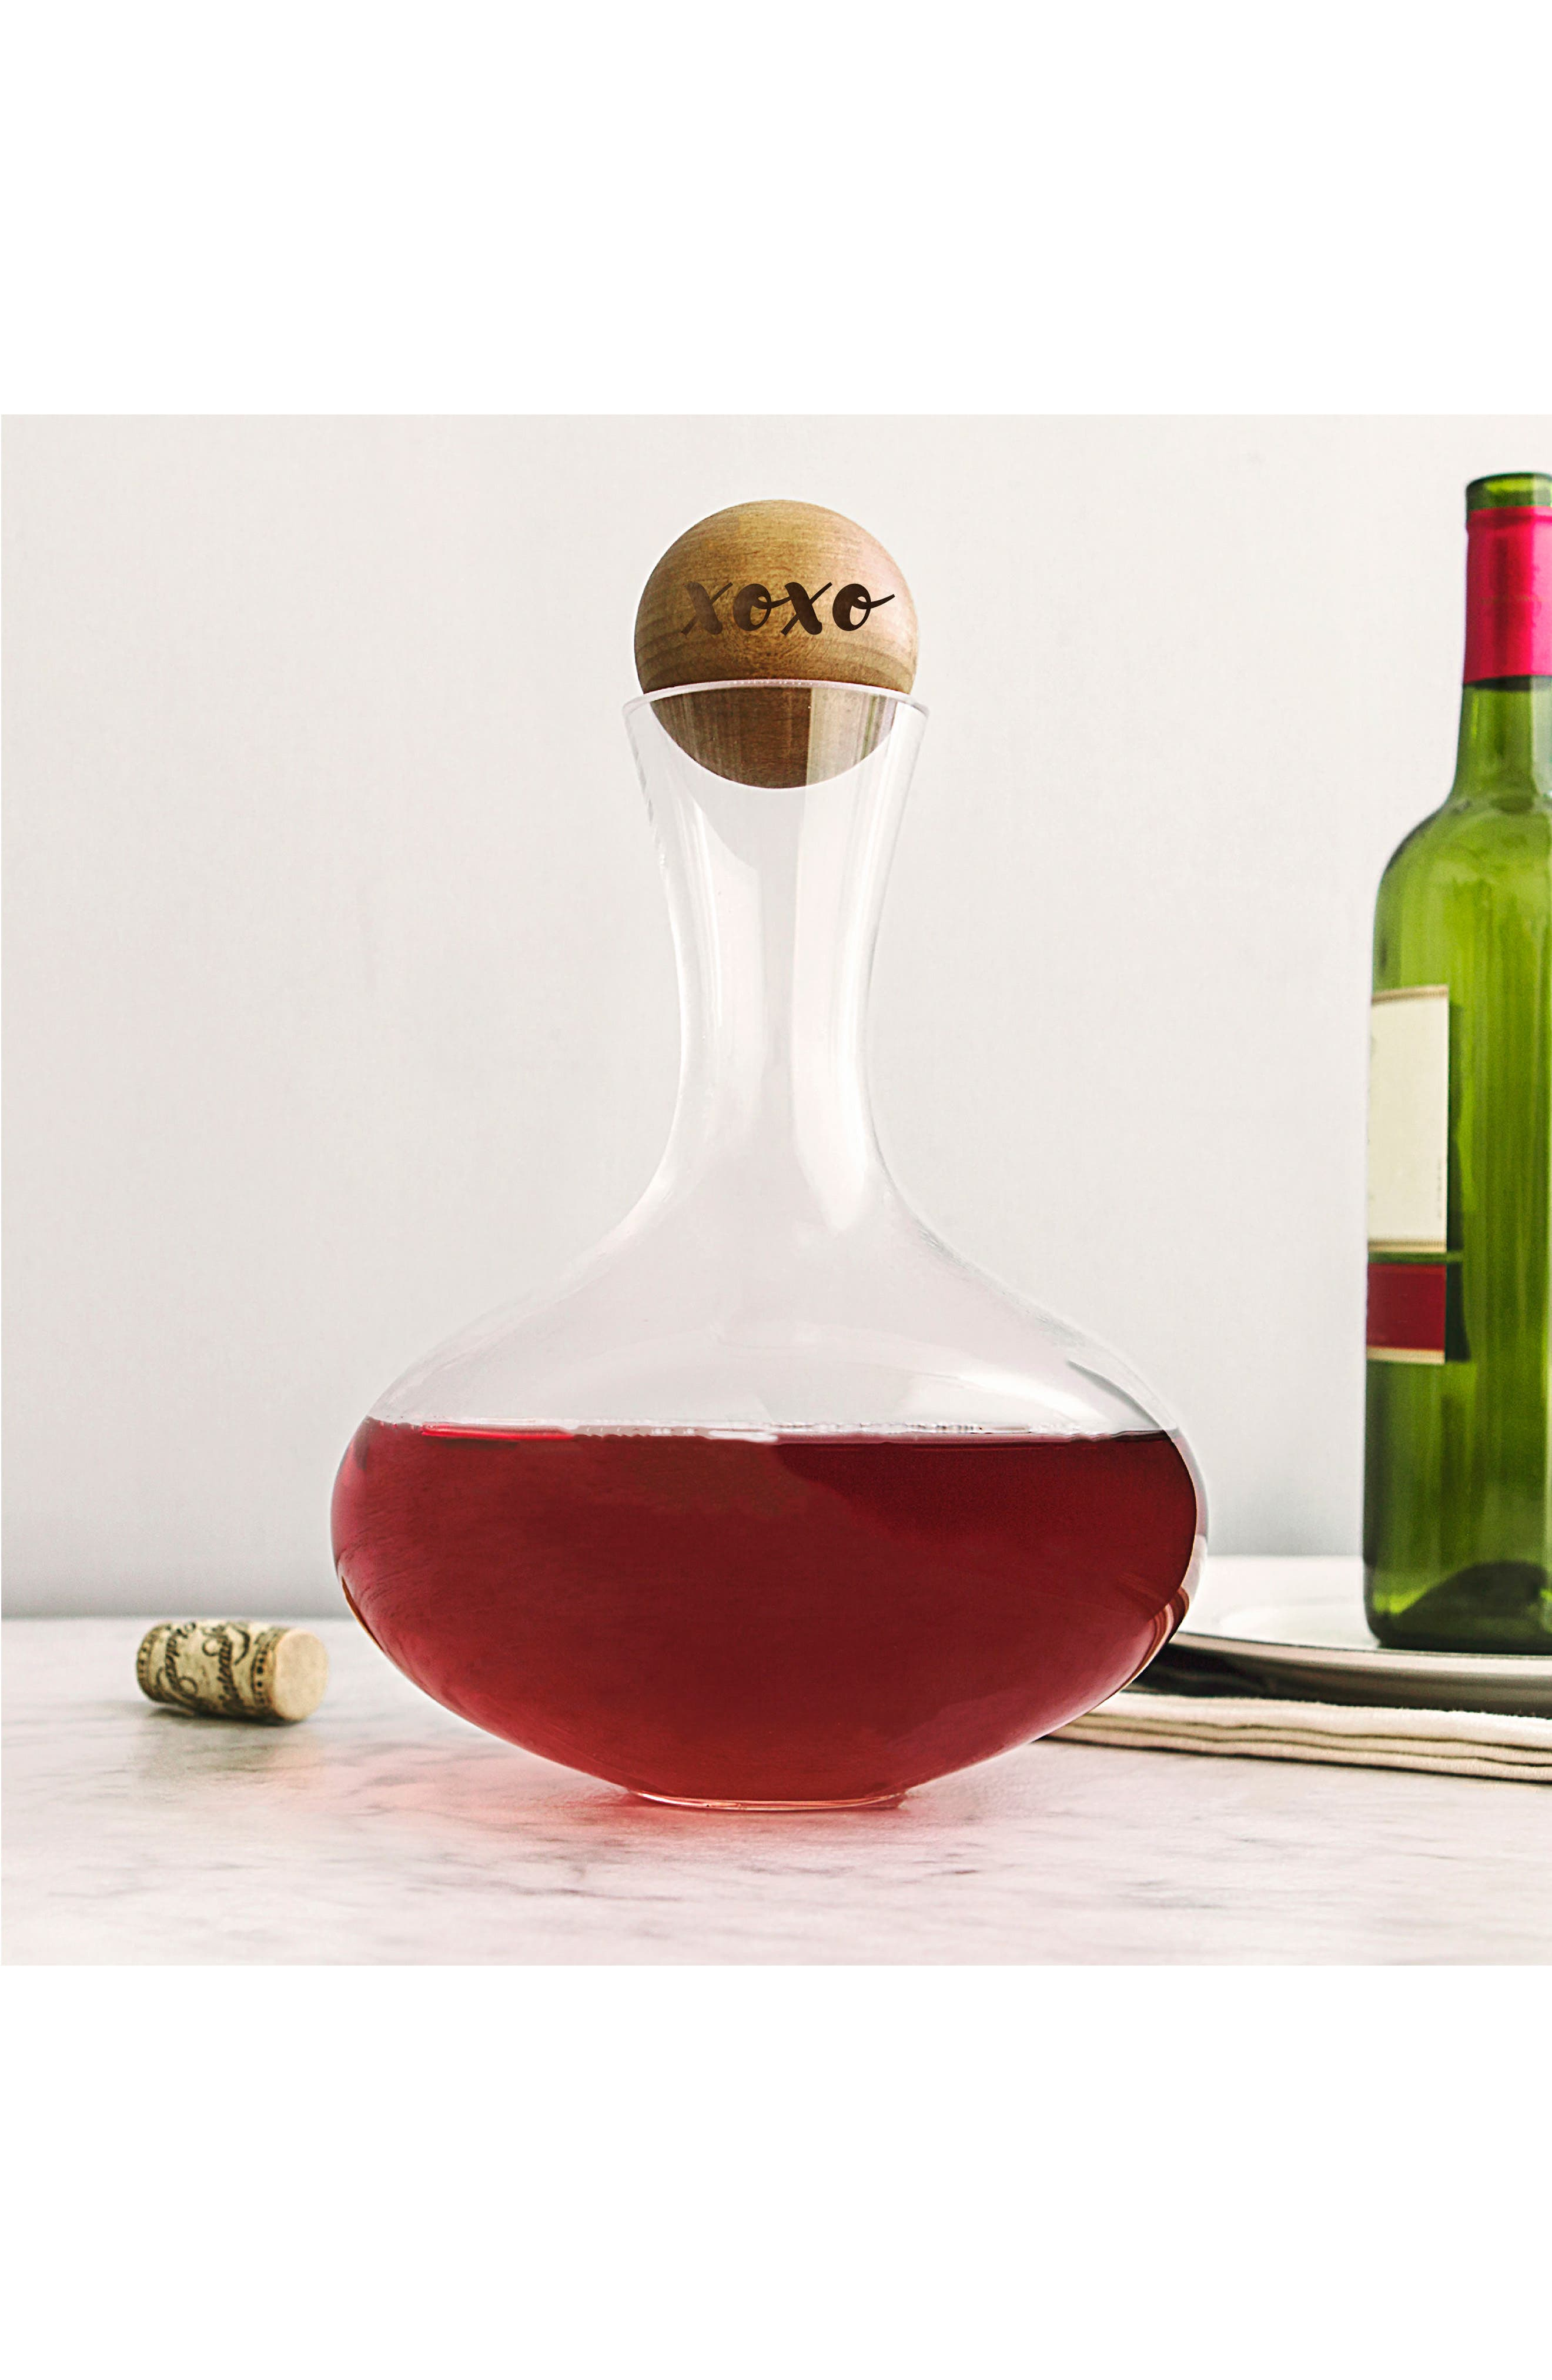 Cathy's Concept XOXO Wine Decanter,                             Alternate thumbnail 2, color,